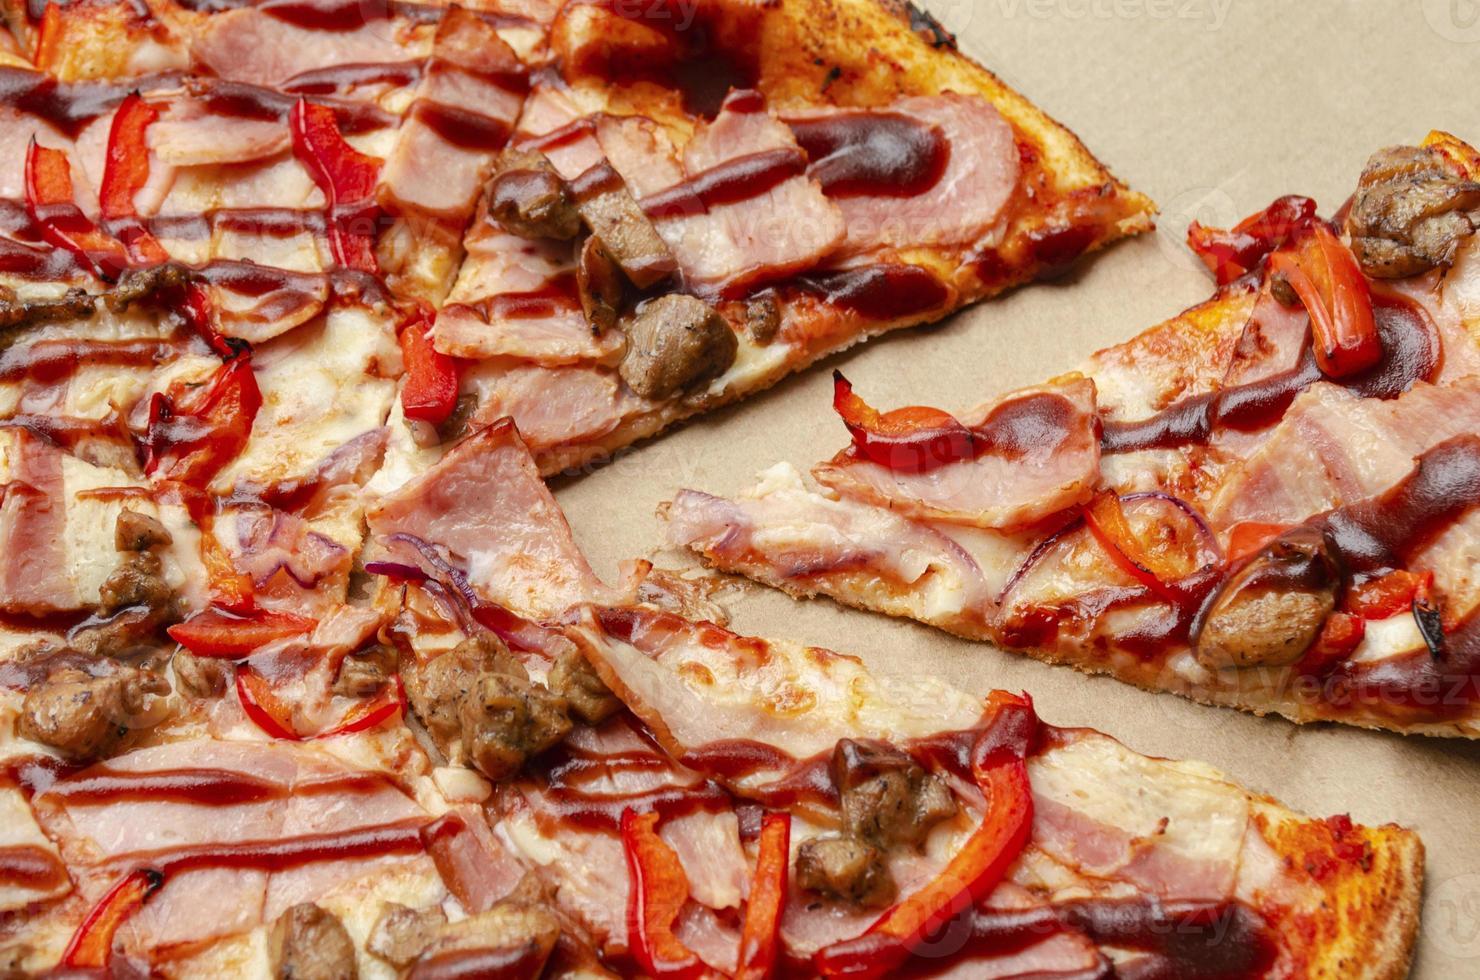 pizza i en låda. separat bit. snabbmat foto